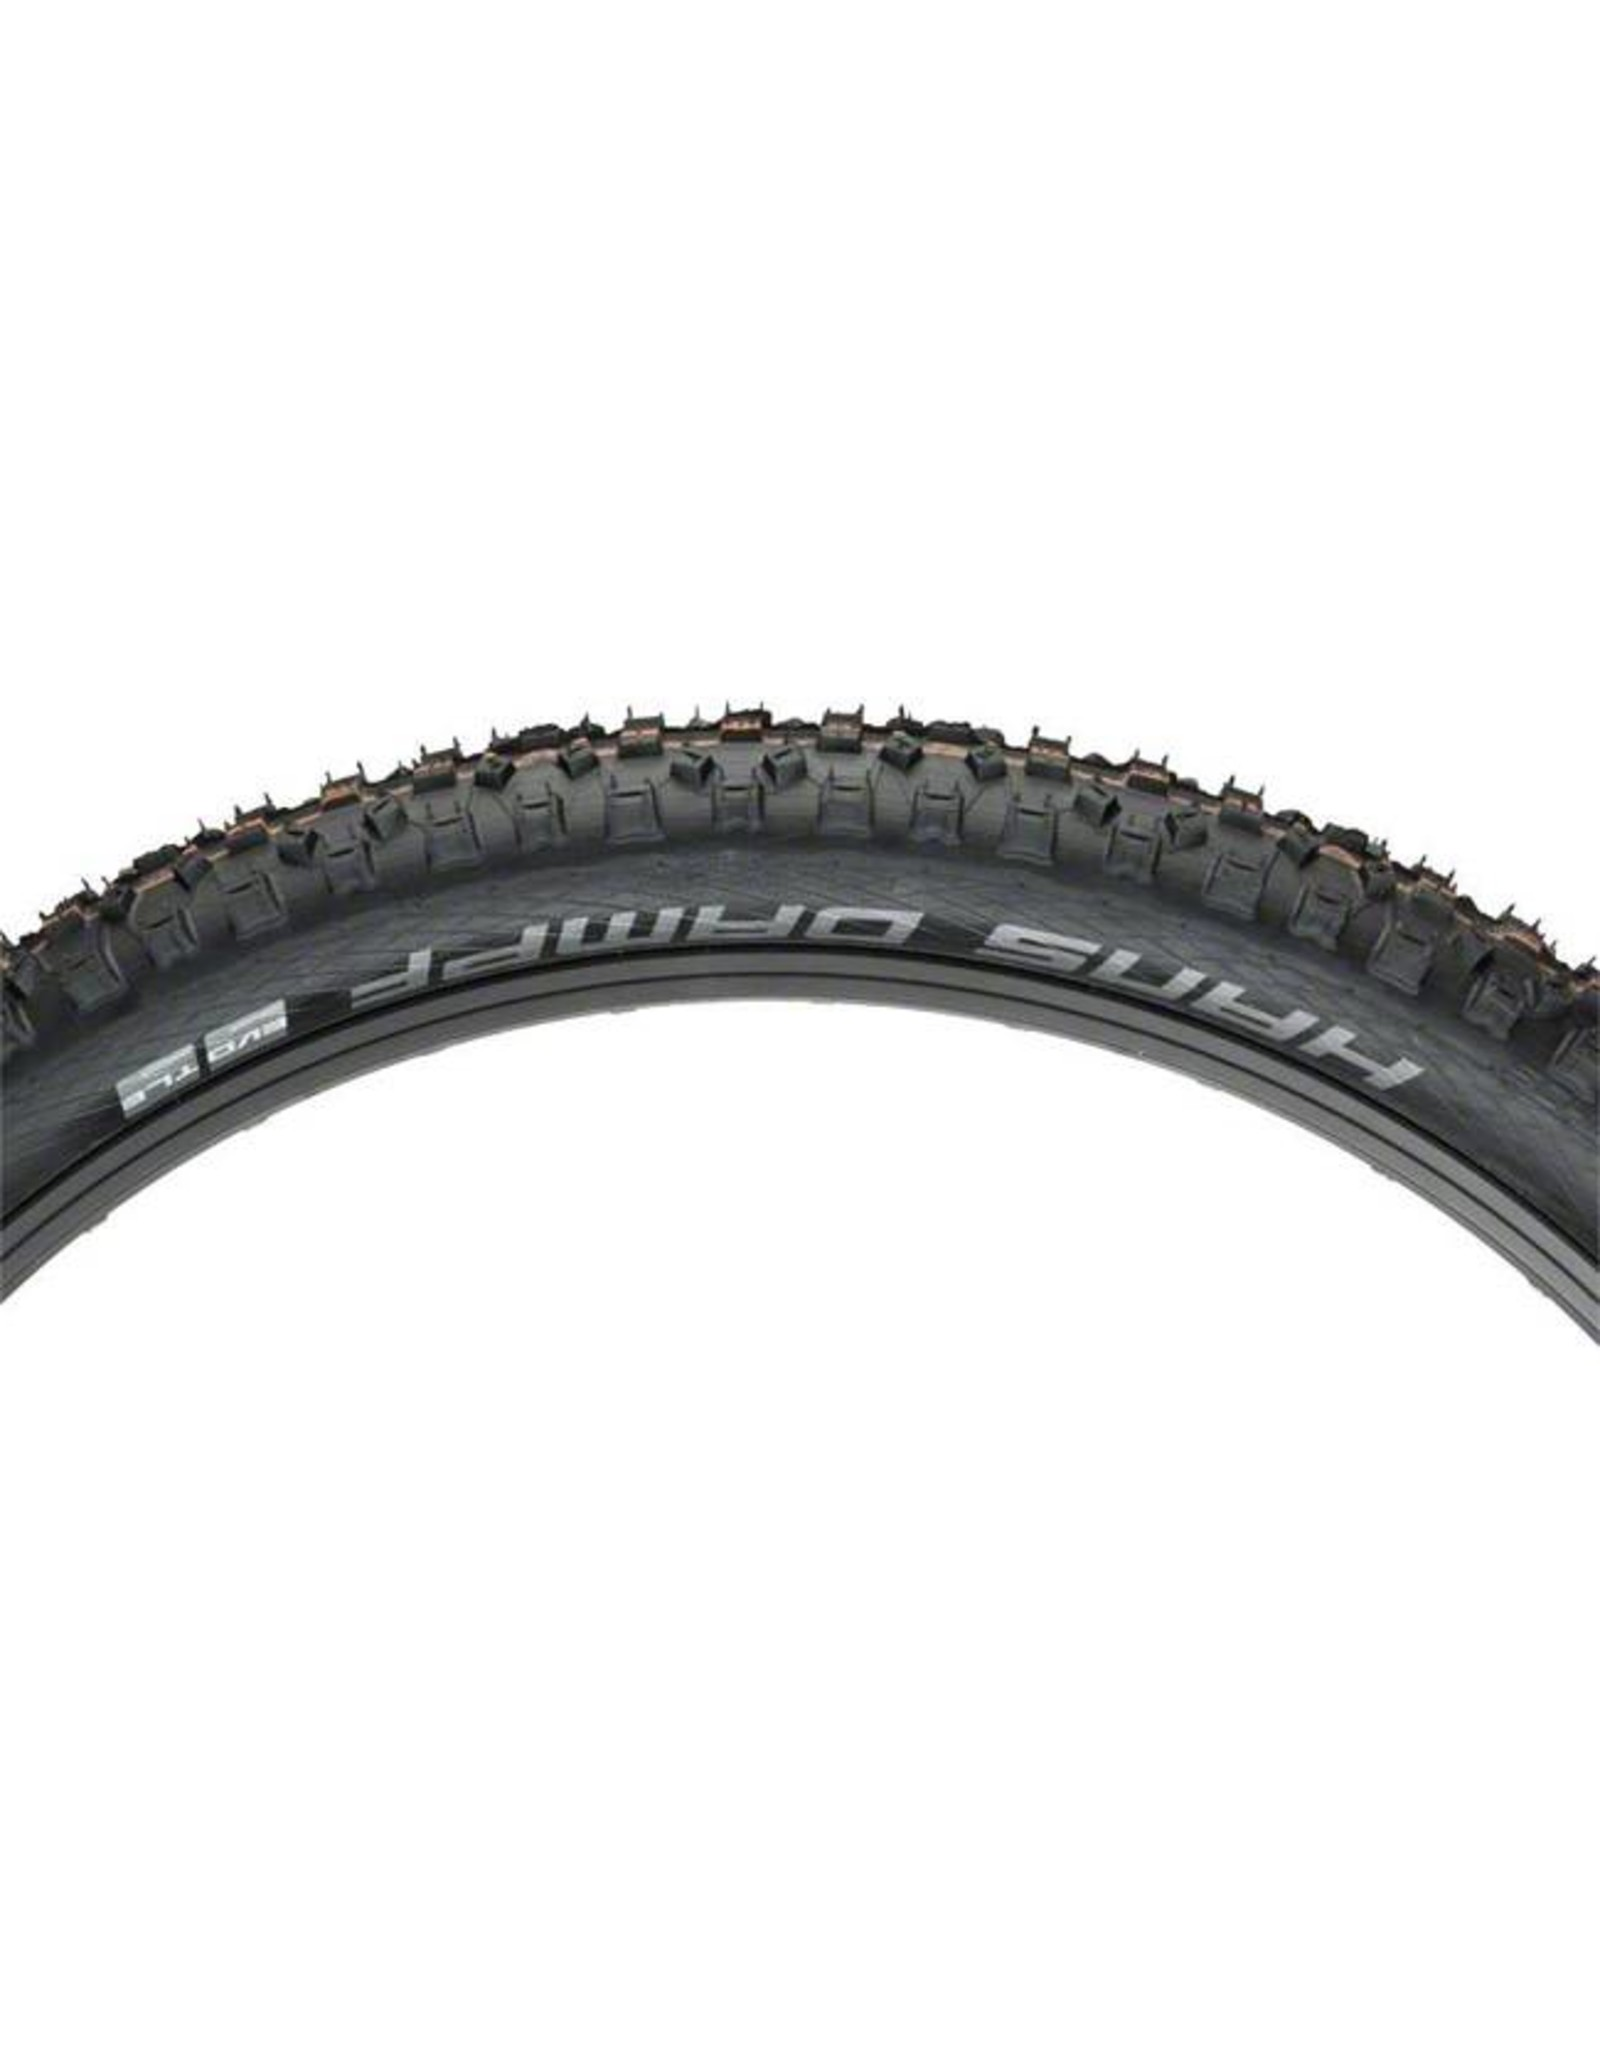 "Schwalbe Schwalbe Hans Dampf Tire: 27.5 x 2.35"", Folding Bead, Evolution Line, Addix Soft Compound, Super Gravity, Tubeless Easy, Black"